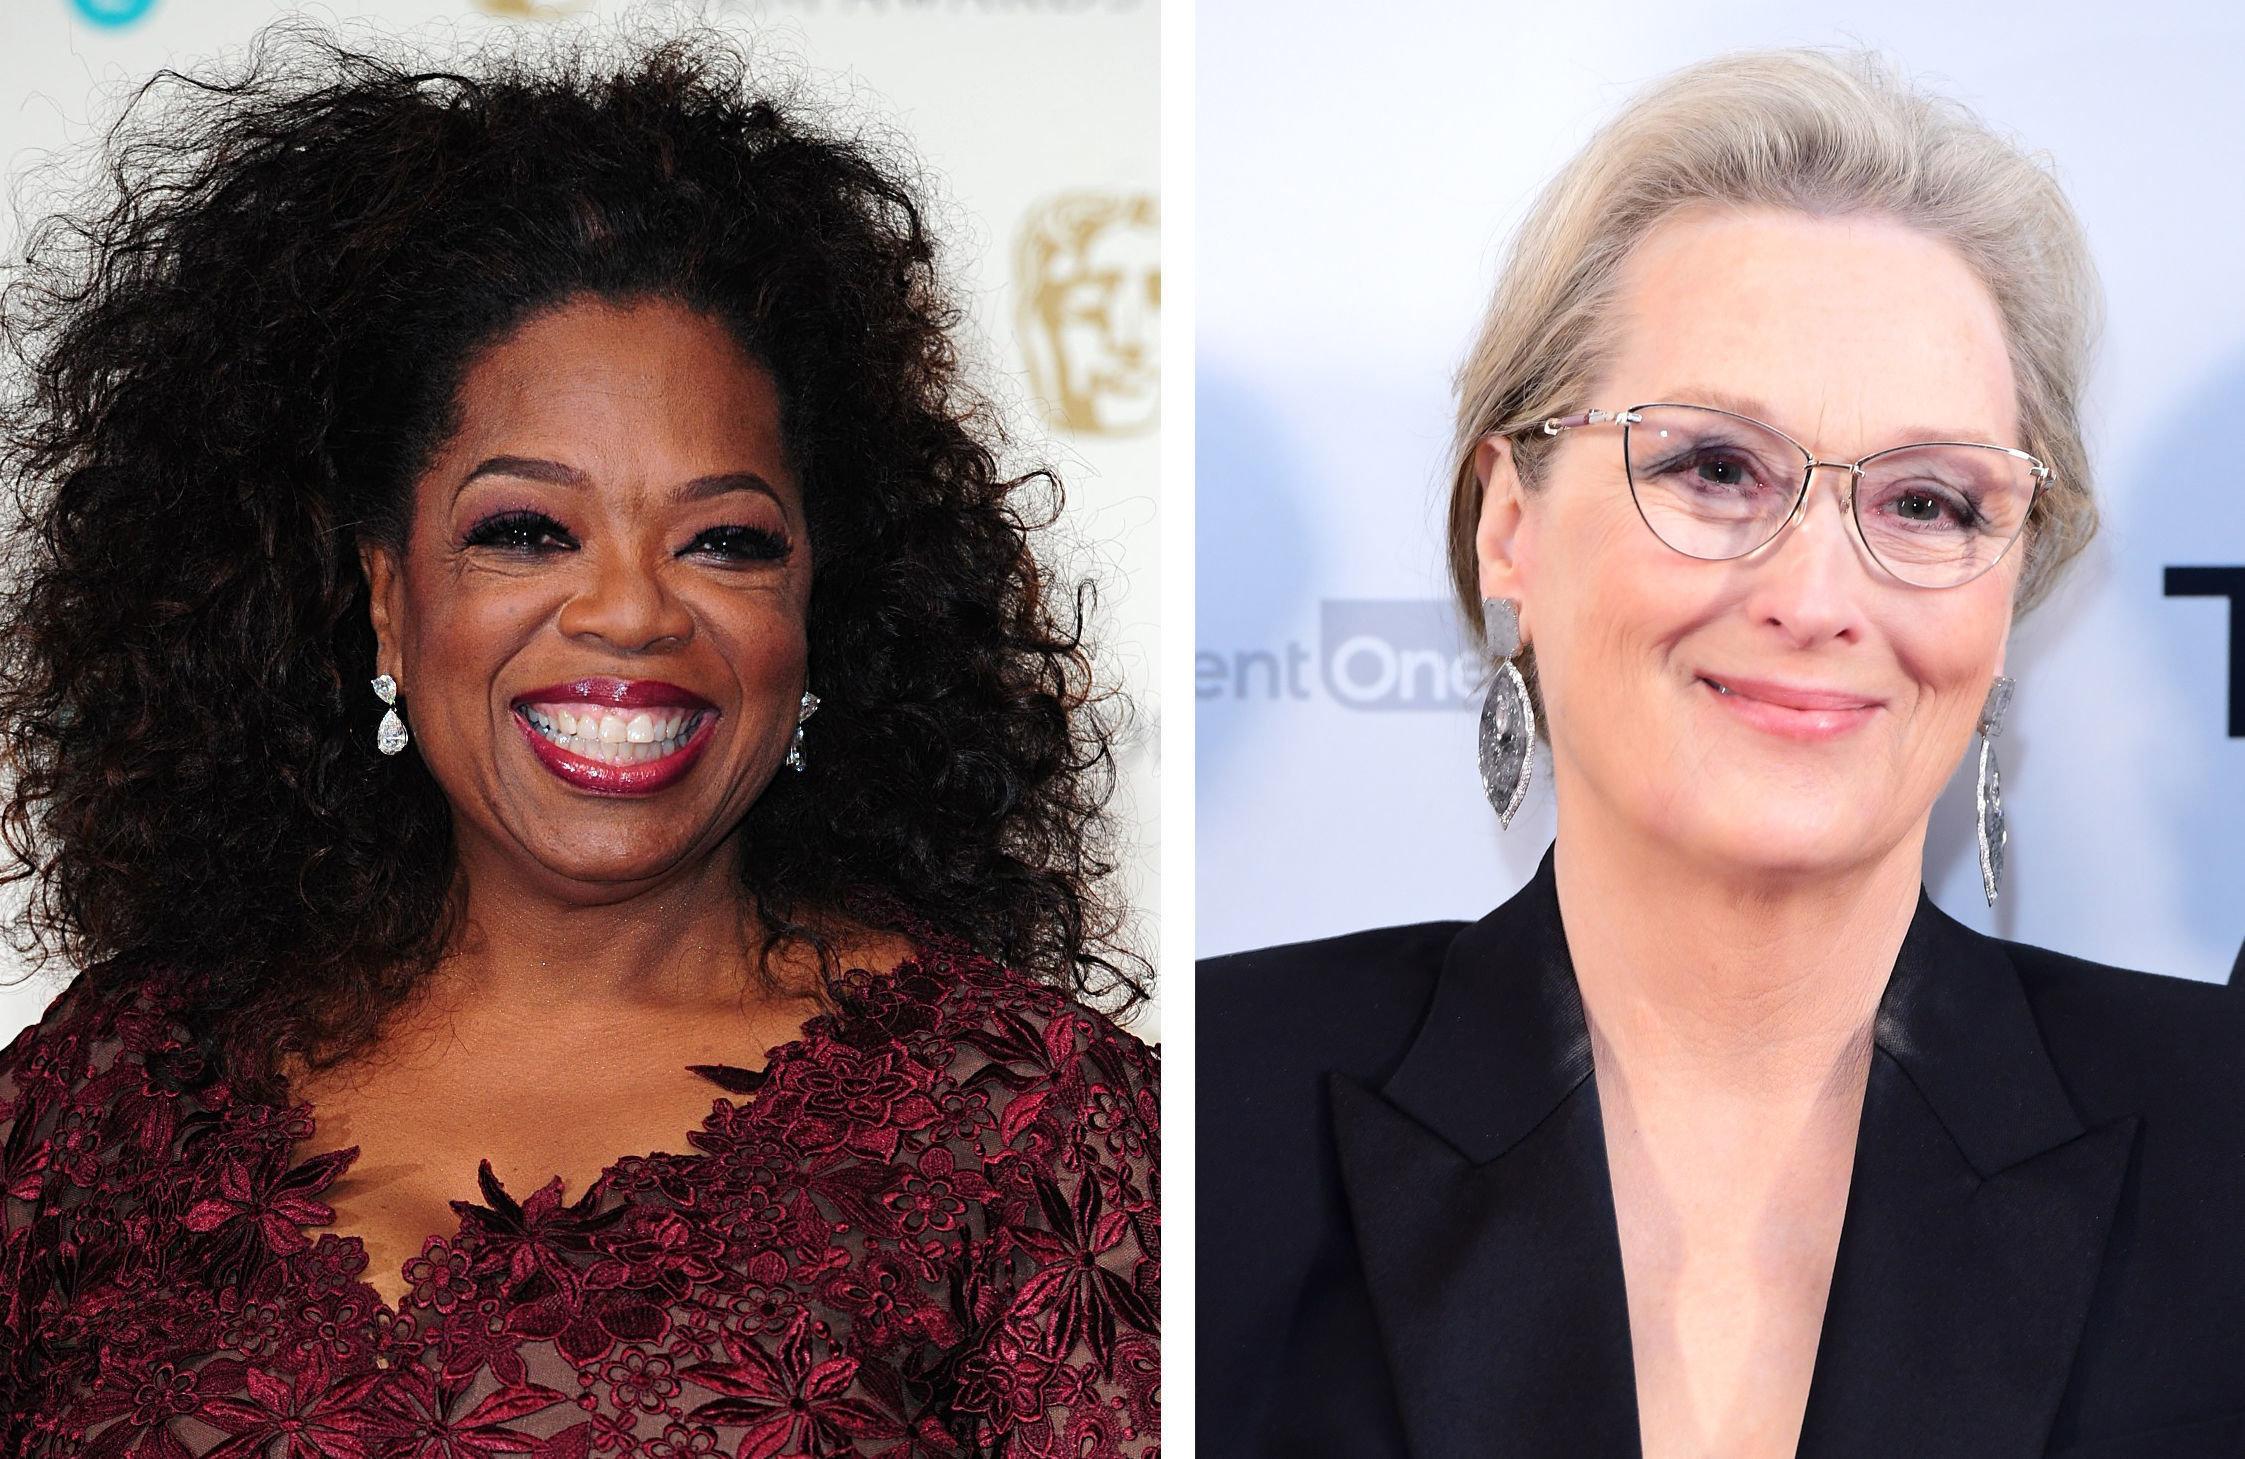 H Oprah Winfrey και η Meryl Streep προειδοποιούν τους παγκόσμιους ηγέτες για την ισότητα των φύλων